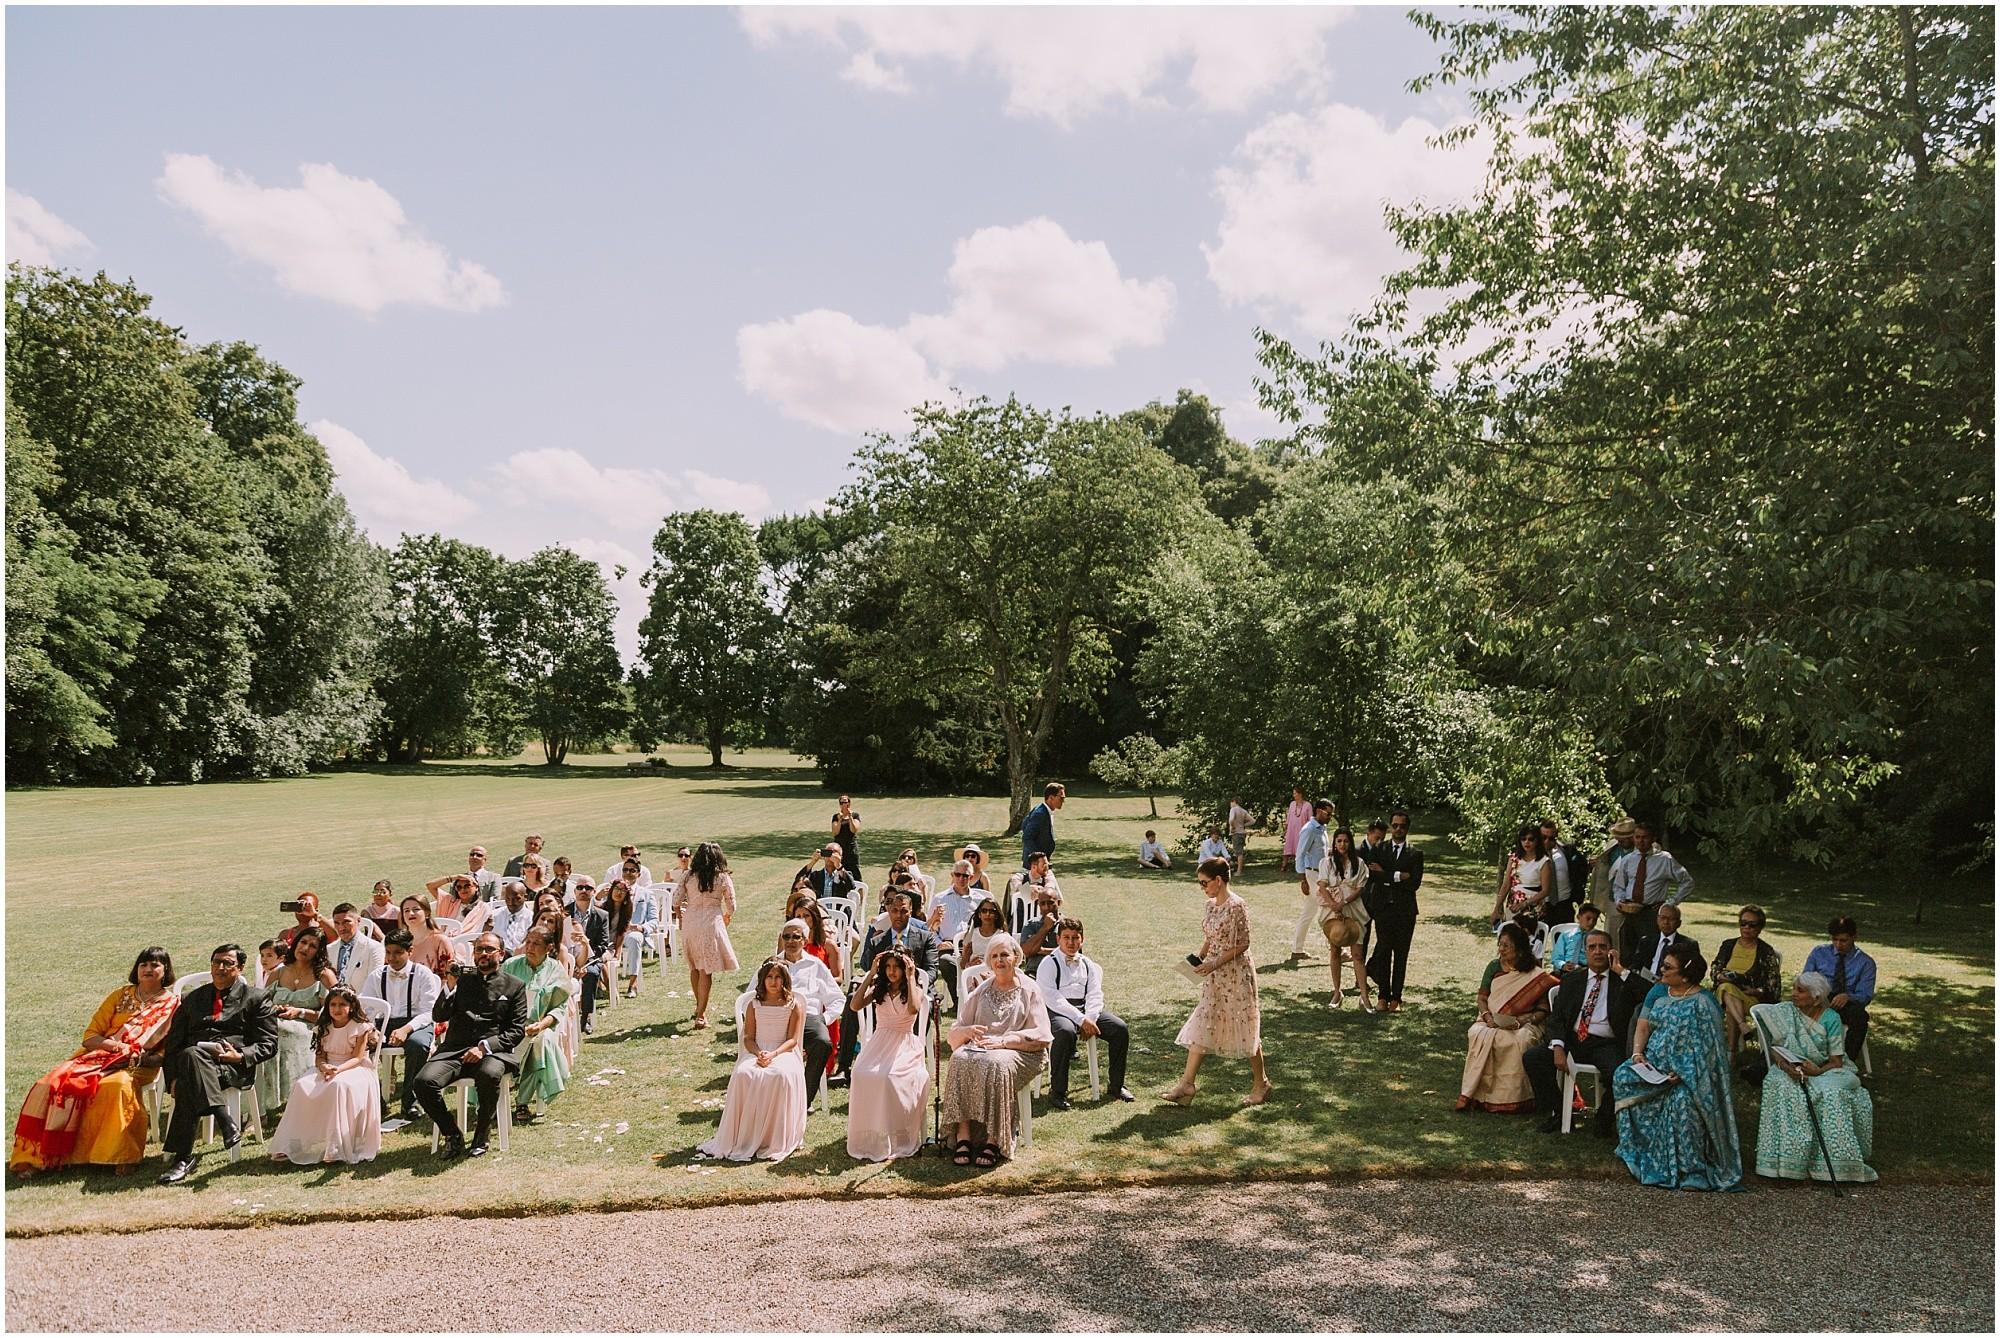 Kateryna-photos-photographer-mariage-chateau-saint-paterne-alencon-normandie-mayenne-le-mans_0077.jpg